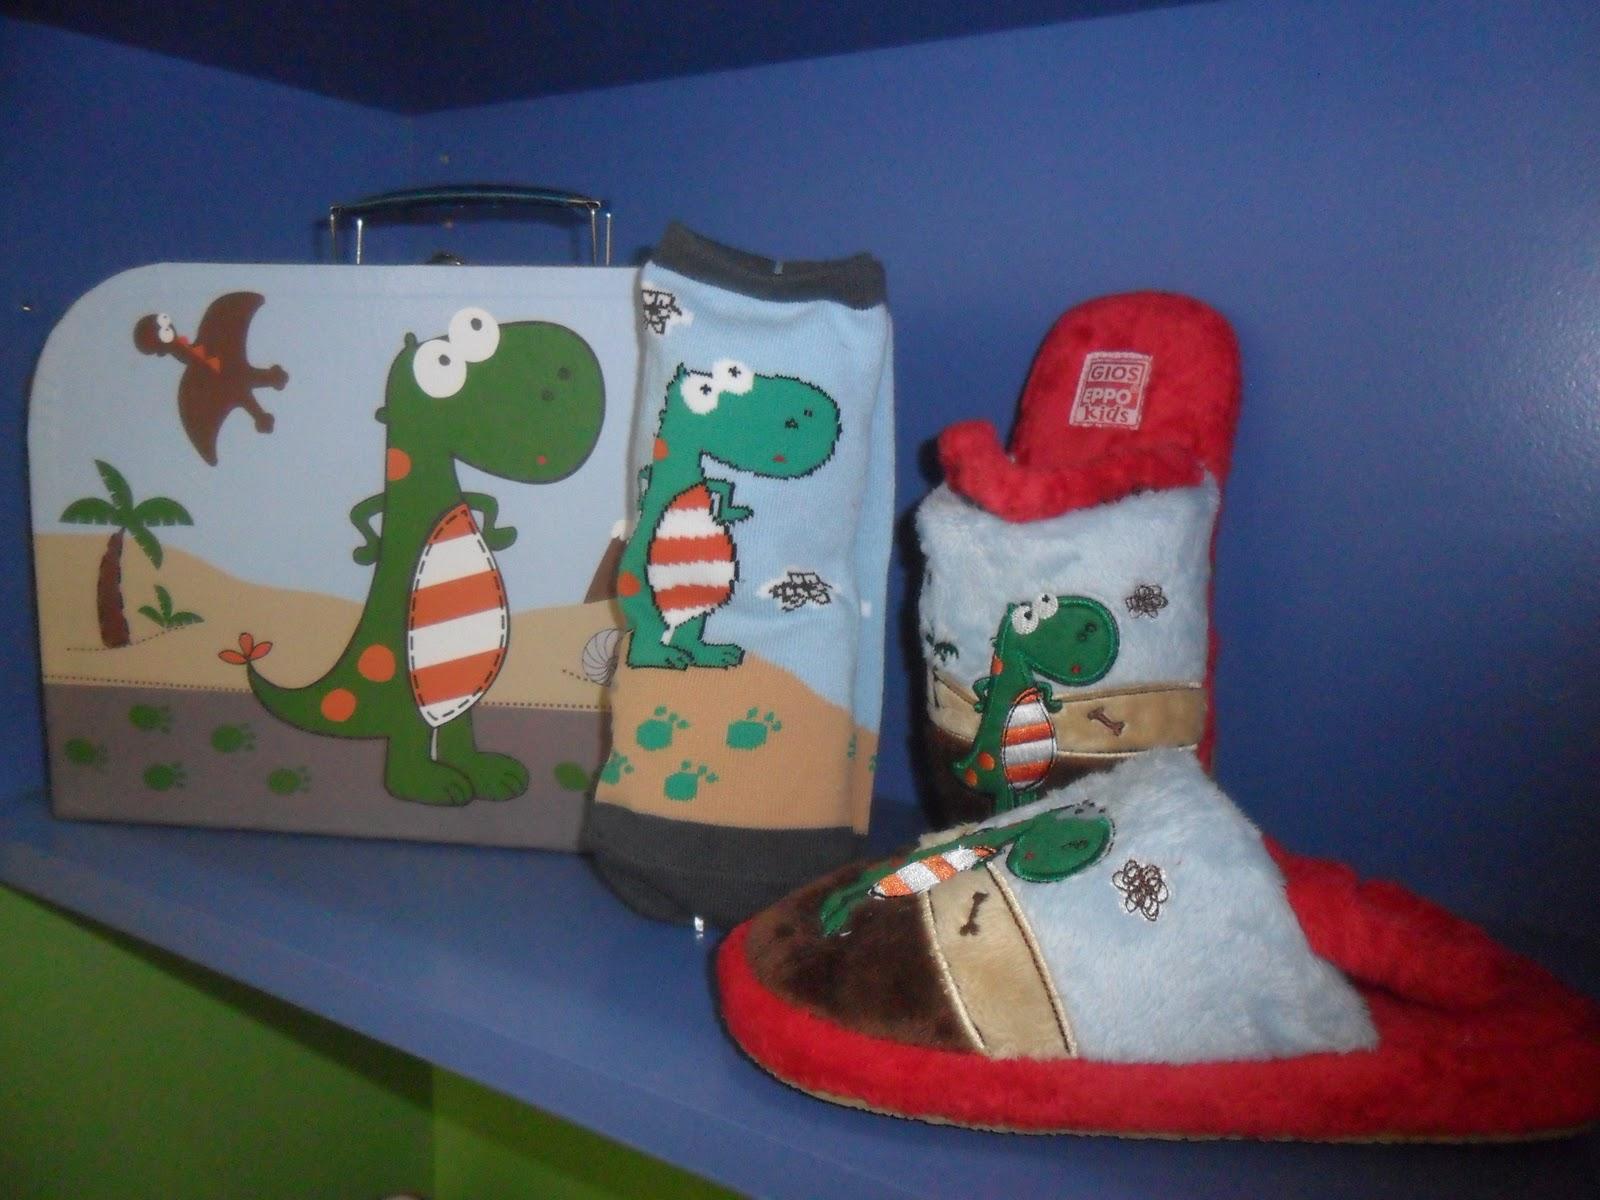 El rastrillo del zapatillo zapateria infantil pelussa for Zapateria infantil